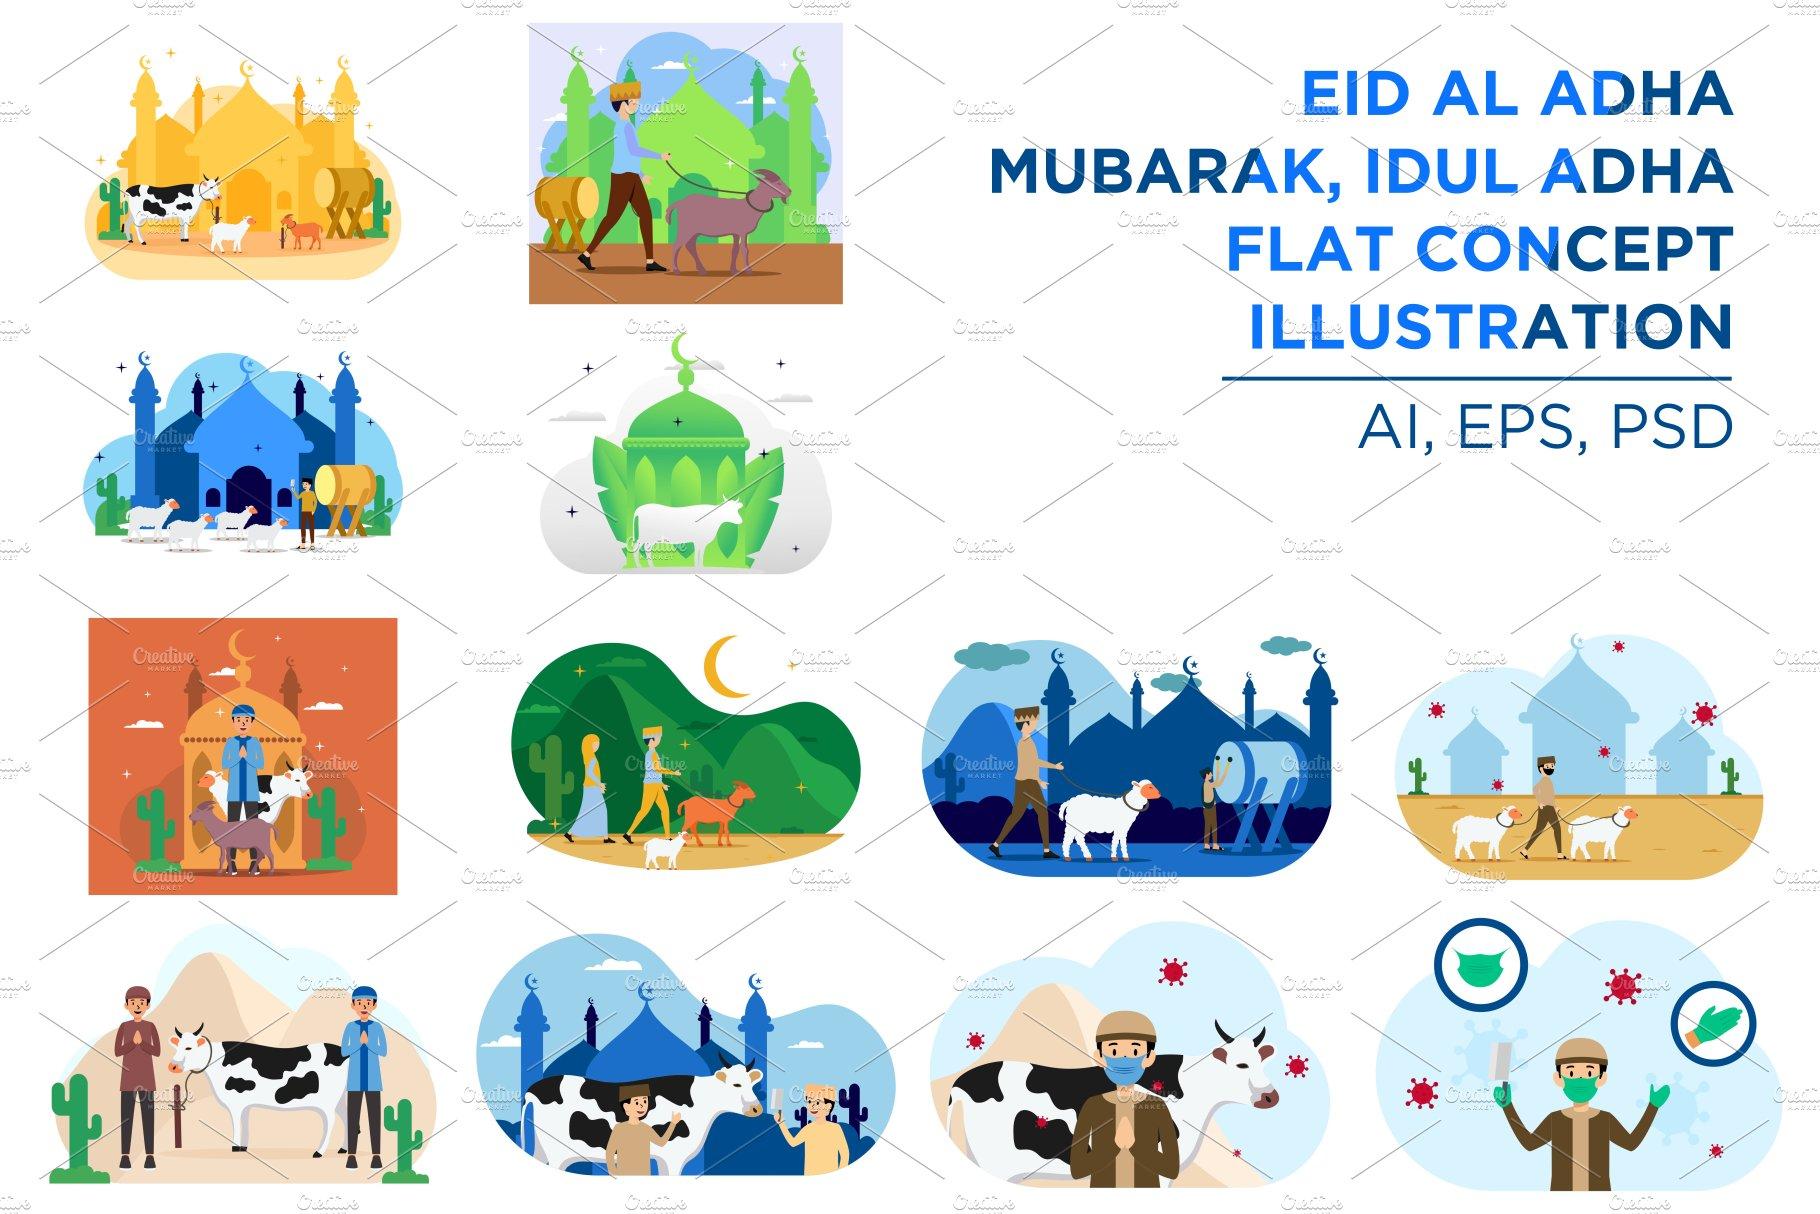 Eid Al Adha Idul Adha Flat Concept Pre Designed Photoshop Graphics Creative Market